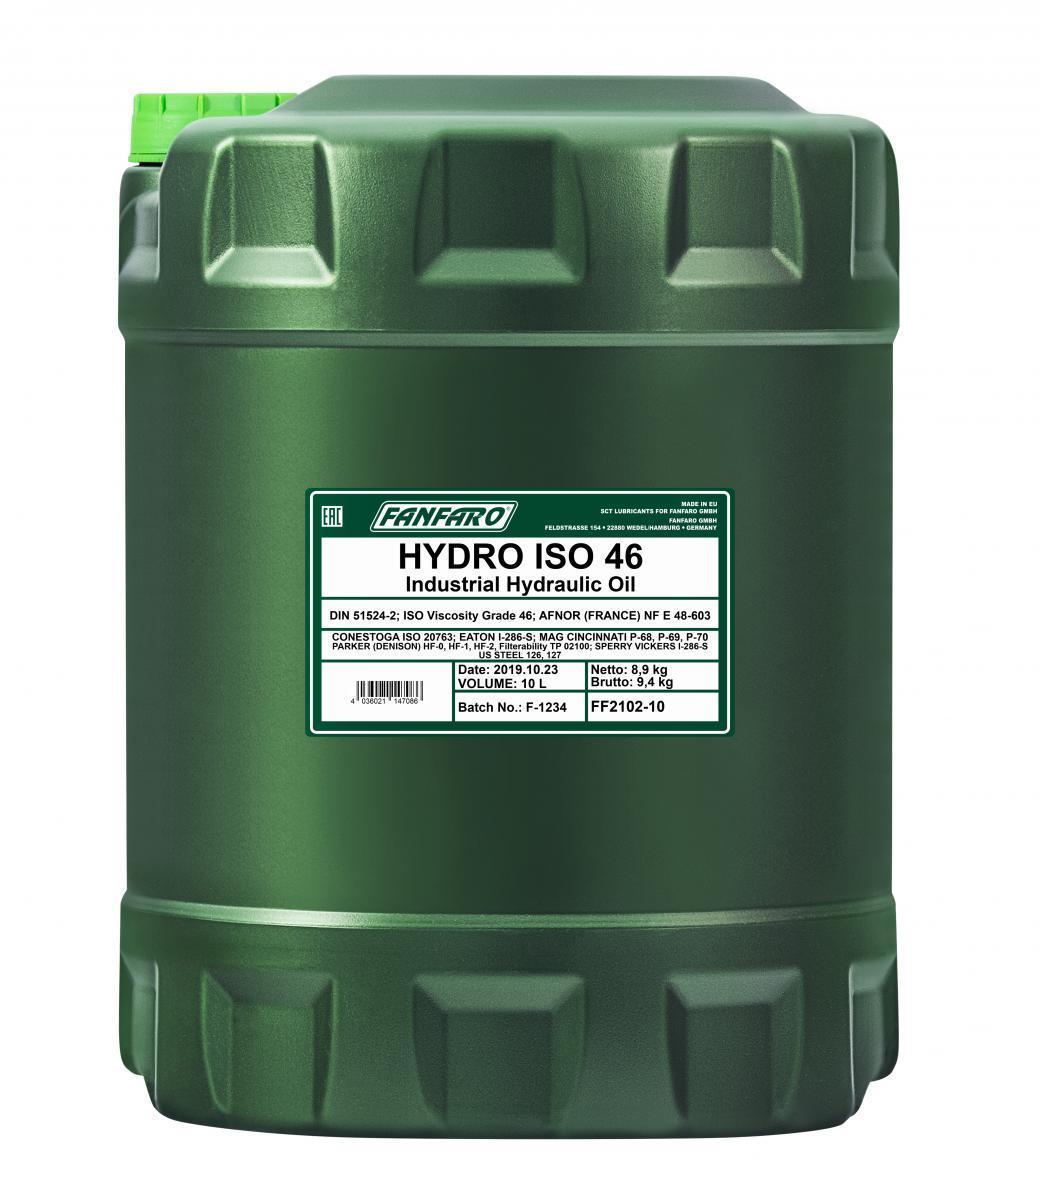 Acquisti FANFARO Olio impianto idraulico FF2102-10 furgone